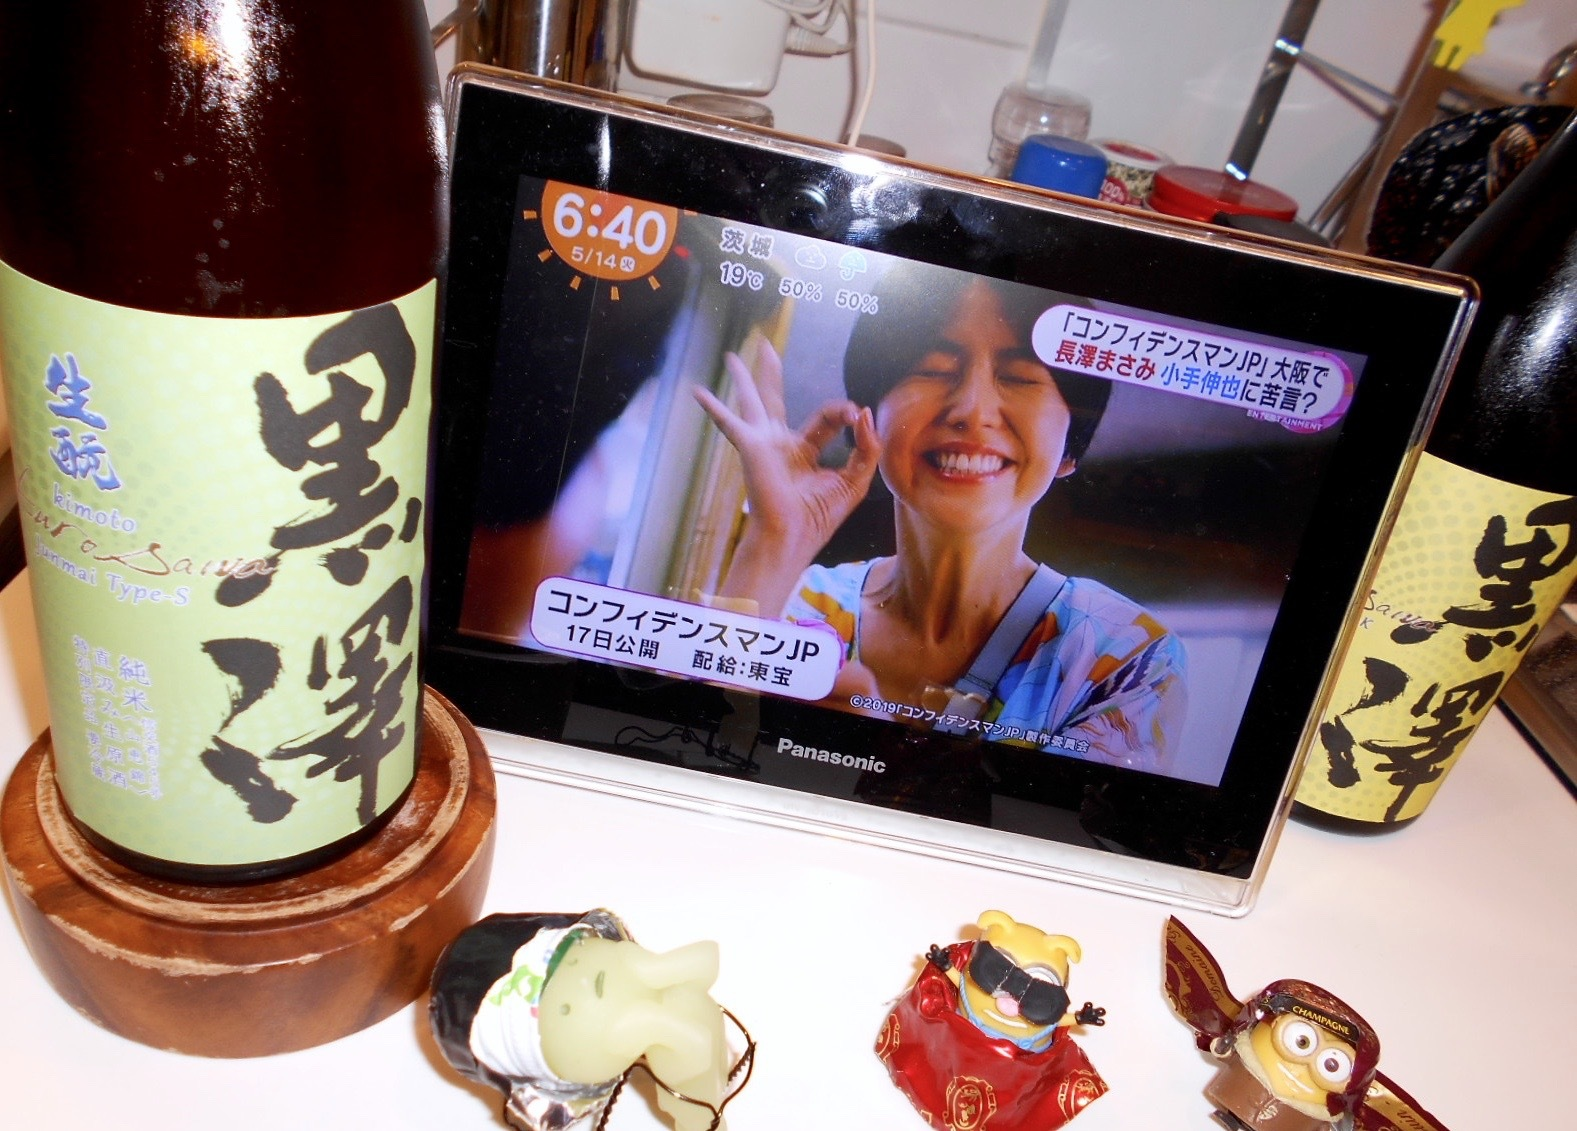 kurosawa_type-s30by1_1.jpg